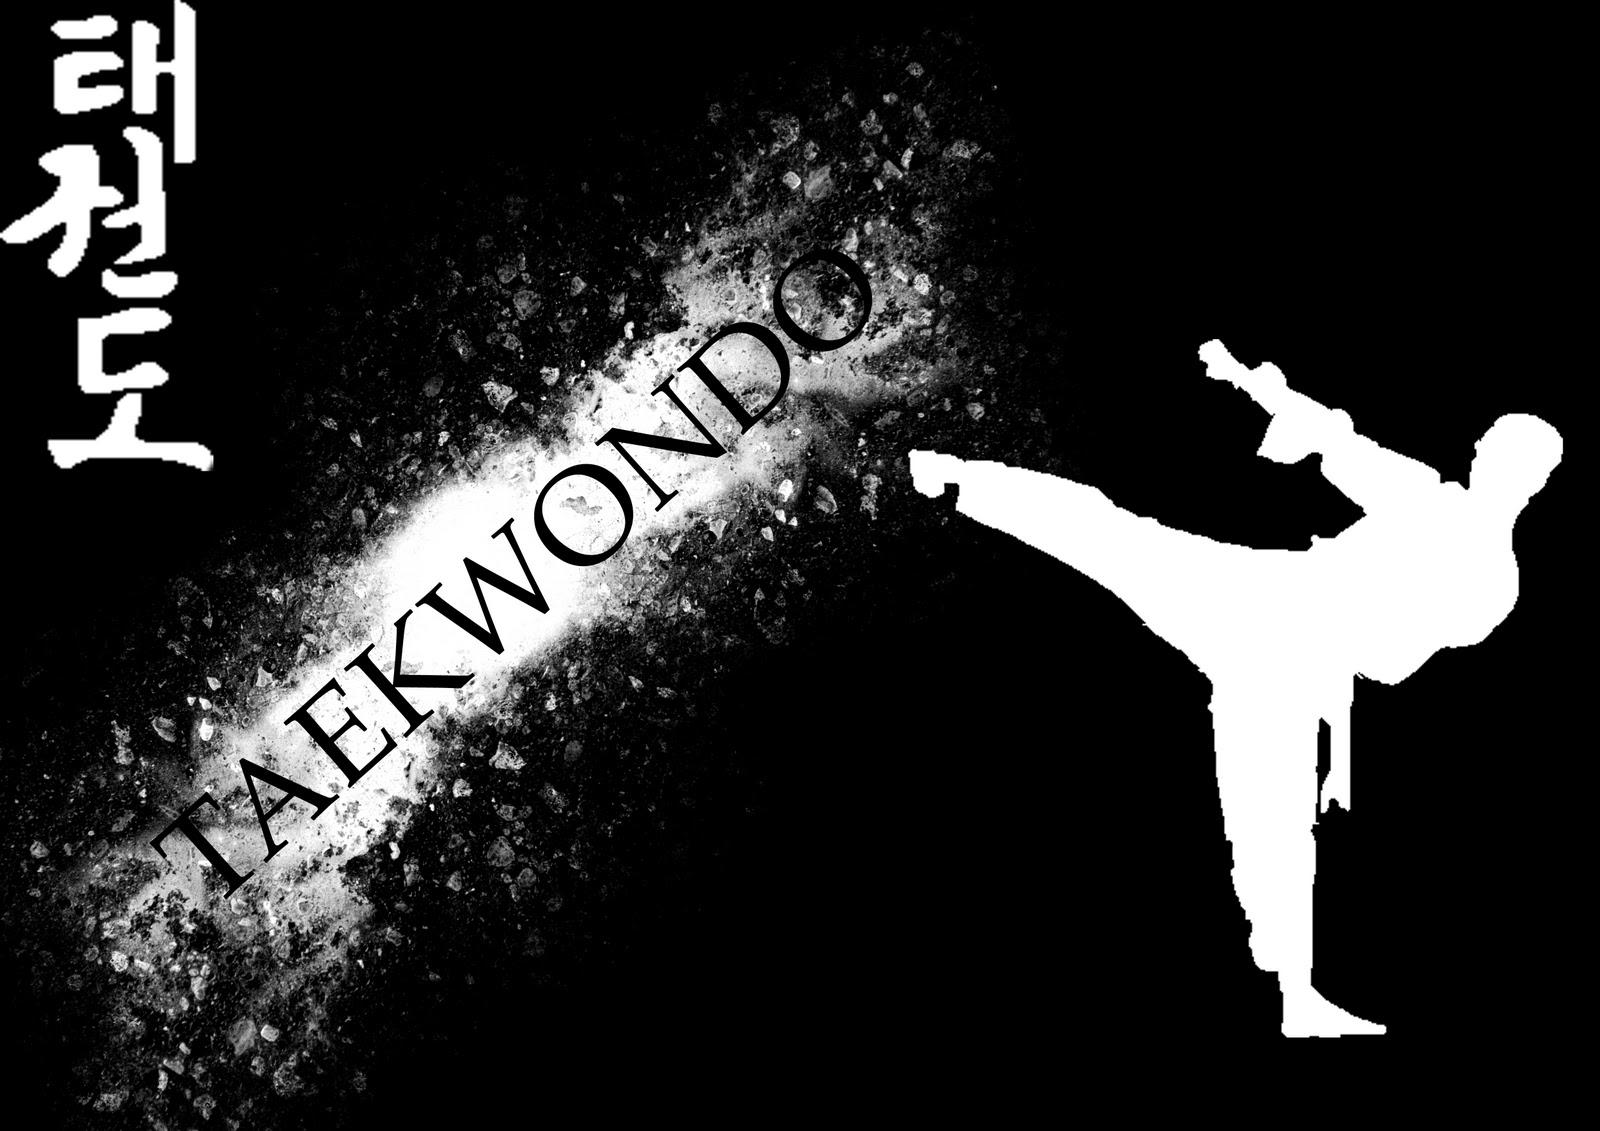 http://3.bp.blogspot.com/-lCs0v4Nv9So/TrSKDVM5GUI/AAAAAAAAAws/86eGfdSvtUc/s1600/Taekwondo_by_djunko.jpg